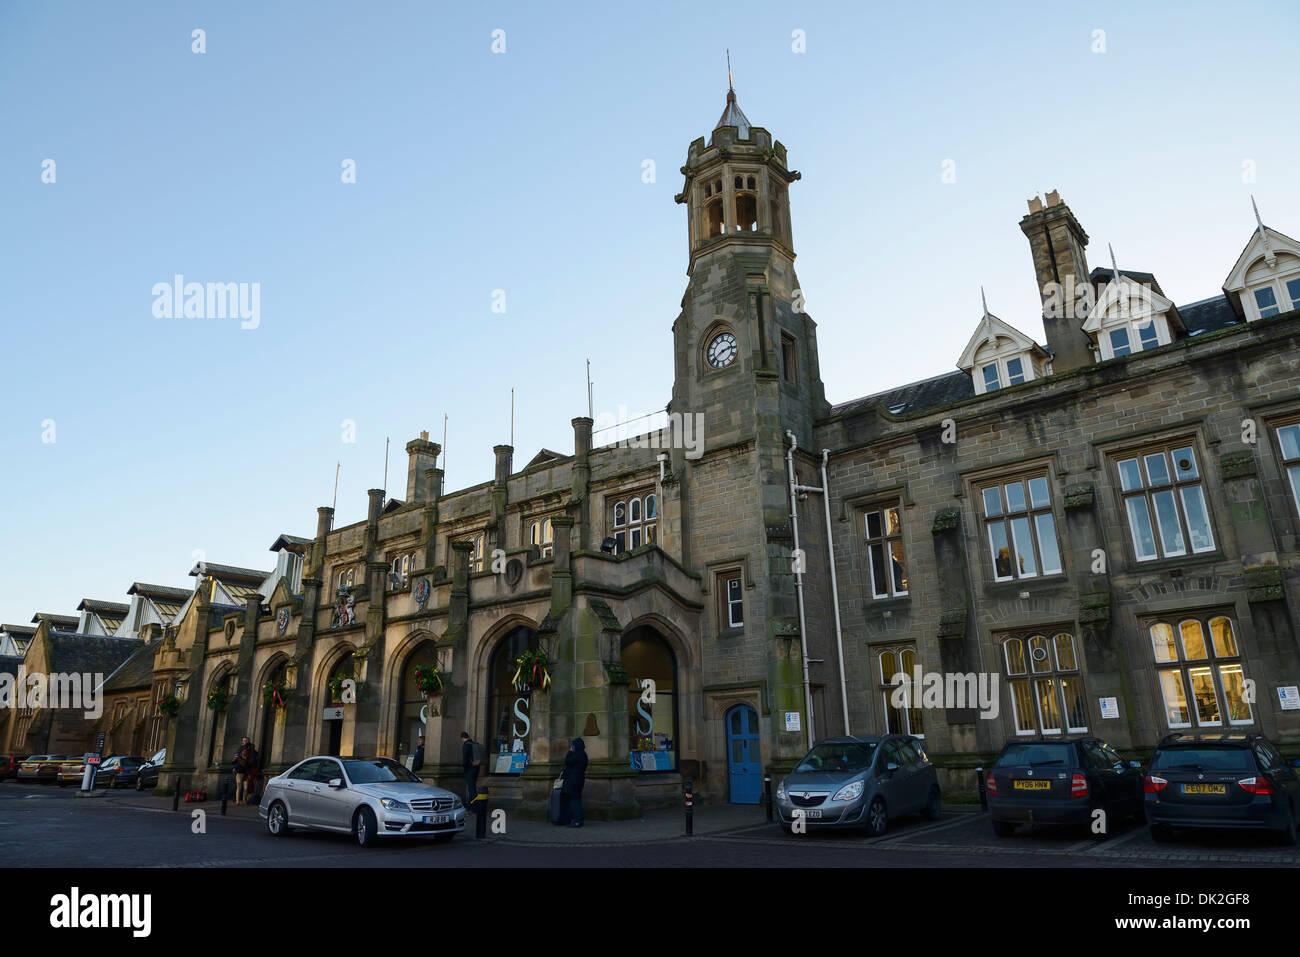 Carlisle Citadel Station - Stock Image